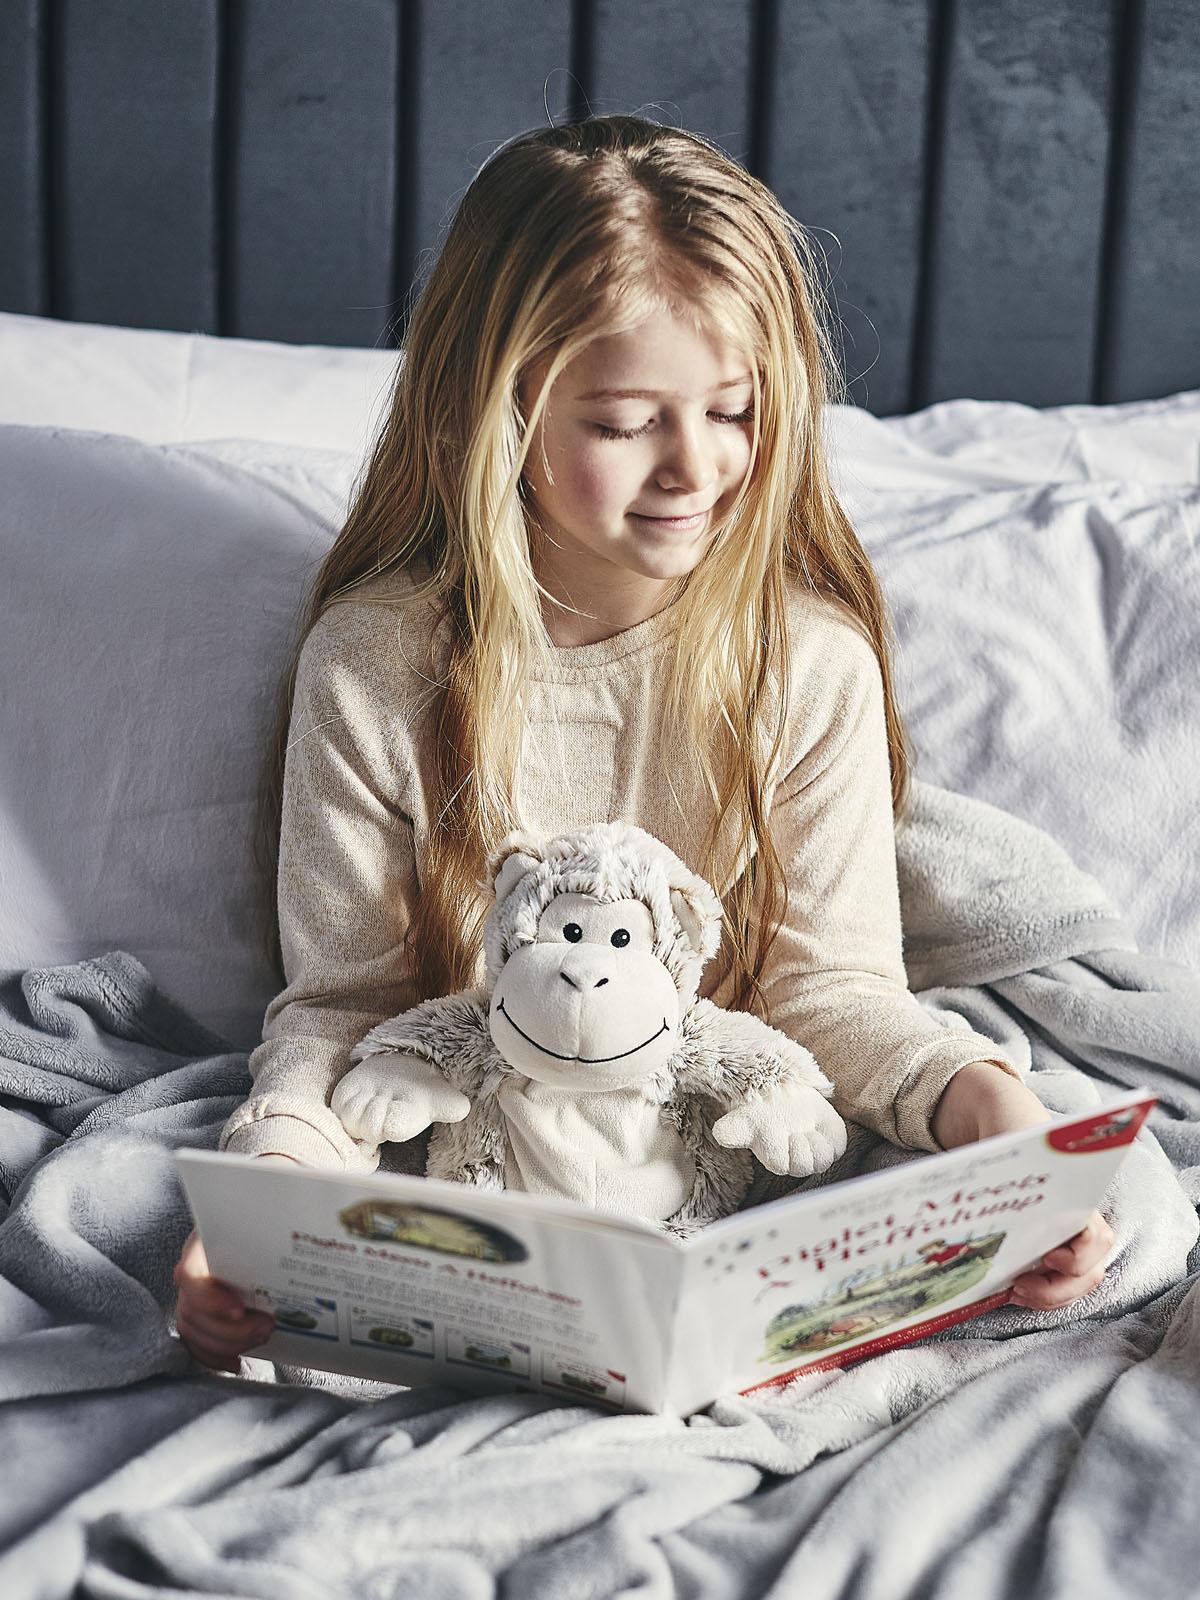 Пинкл (Pinkl) | Игрушка-грелка Marshmallow Обезьяна | Intelex Warmies Cozy Plush Marshmallow Monkey